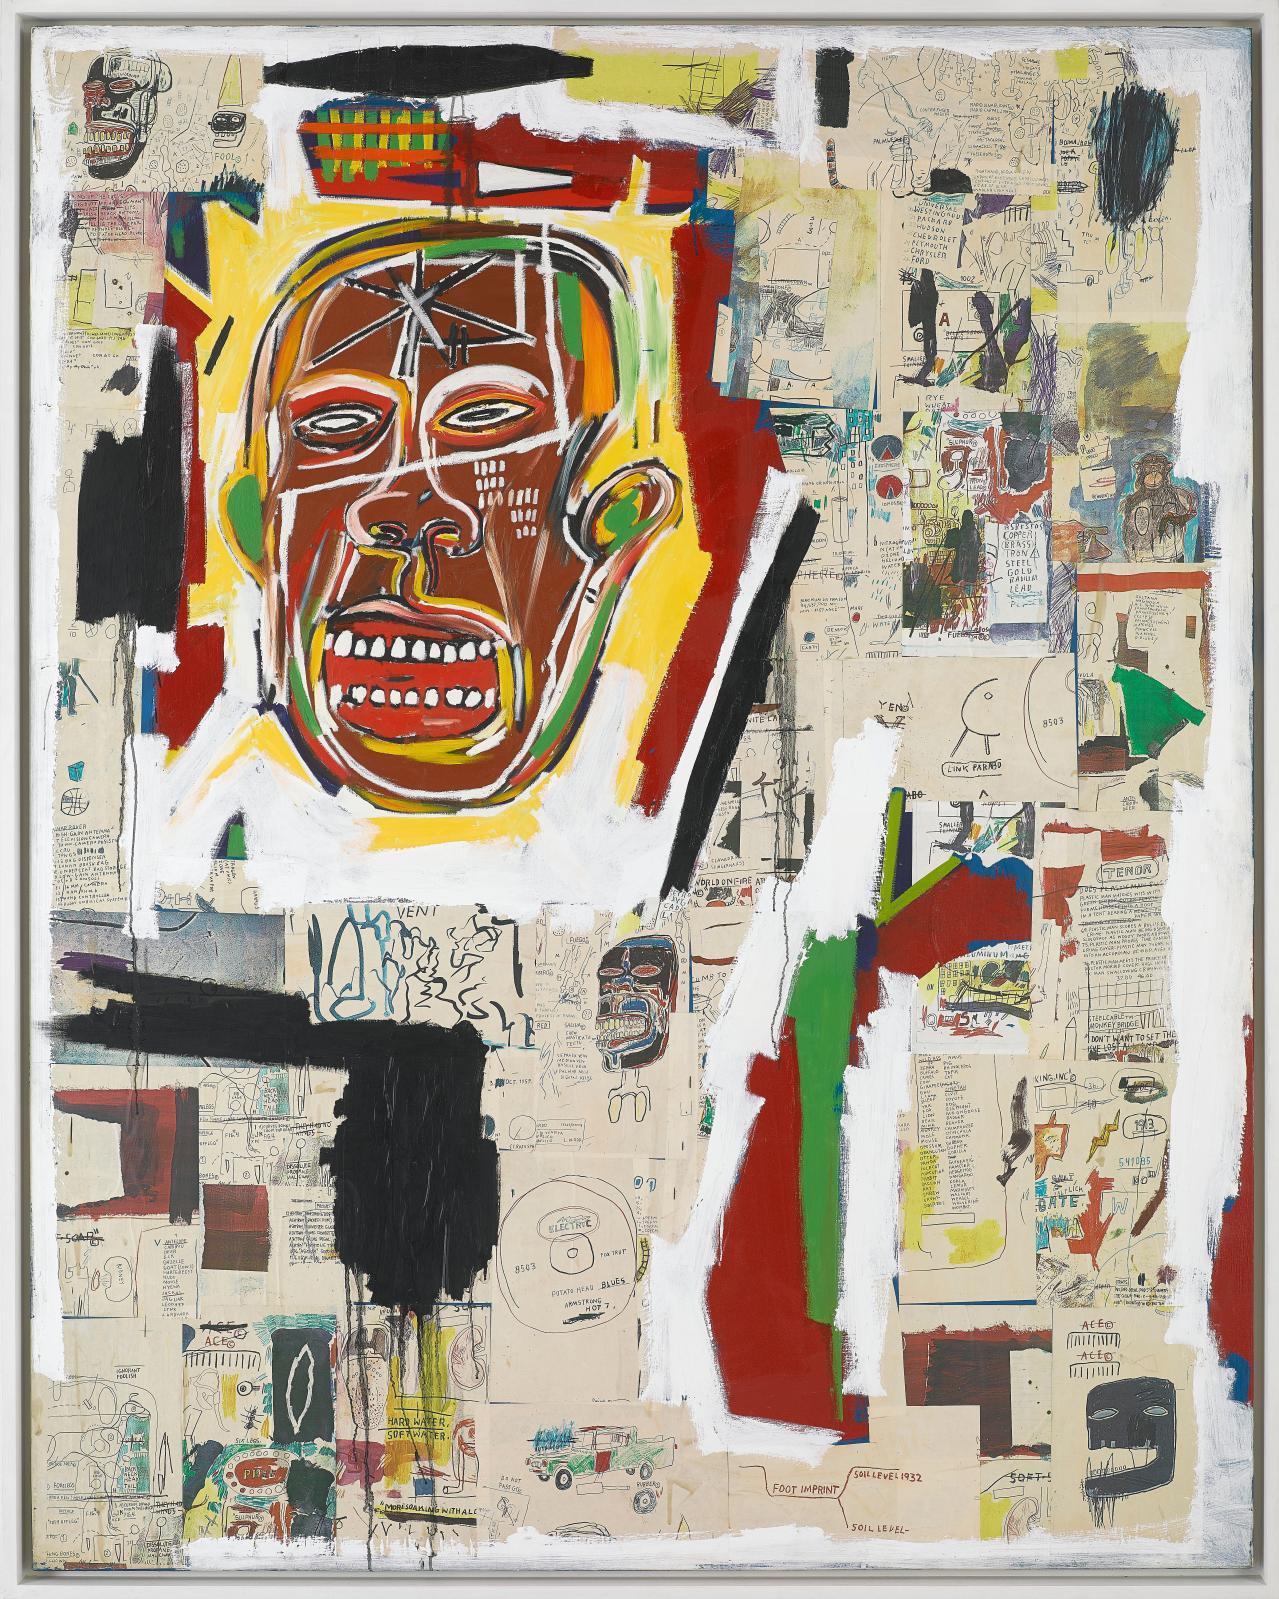 Jean-Michel Basquiat (1960-1988), King of the Zulus, 1984-1985, Museum of Contemporary Art (MAC) in Marseille.© Photo DR © service de pre